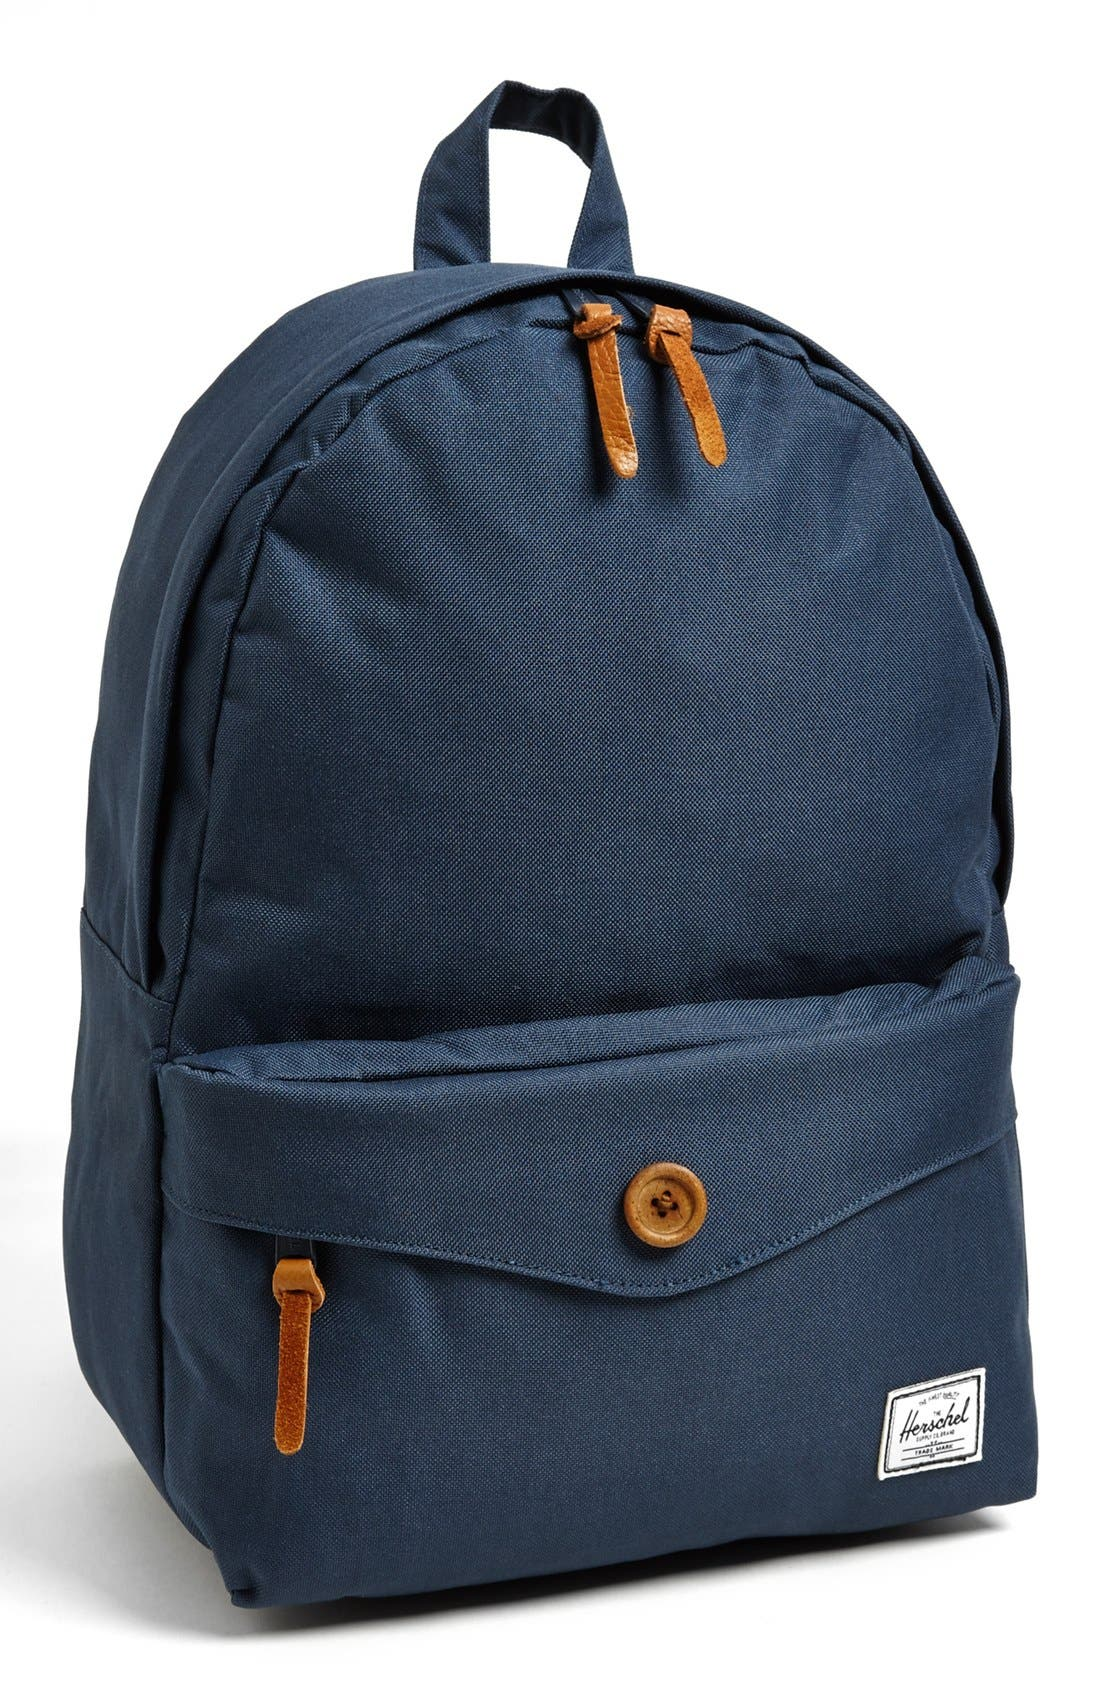 'Sydney' Backpack,                             Main thumbnail 1, color,                             NAVY